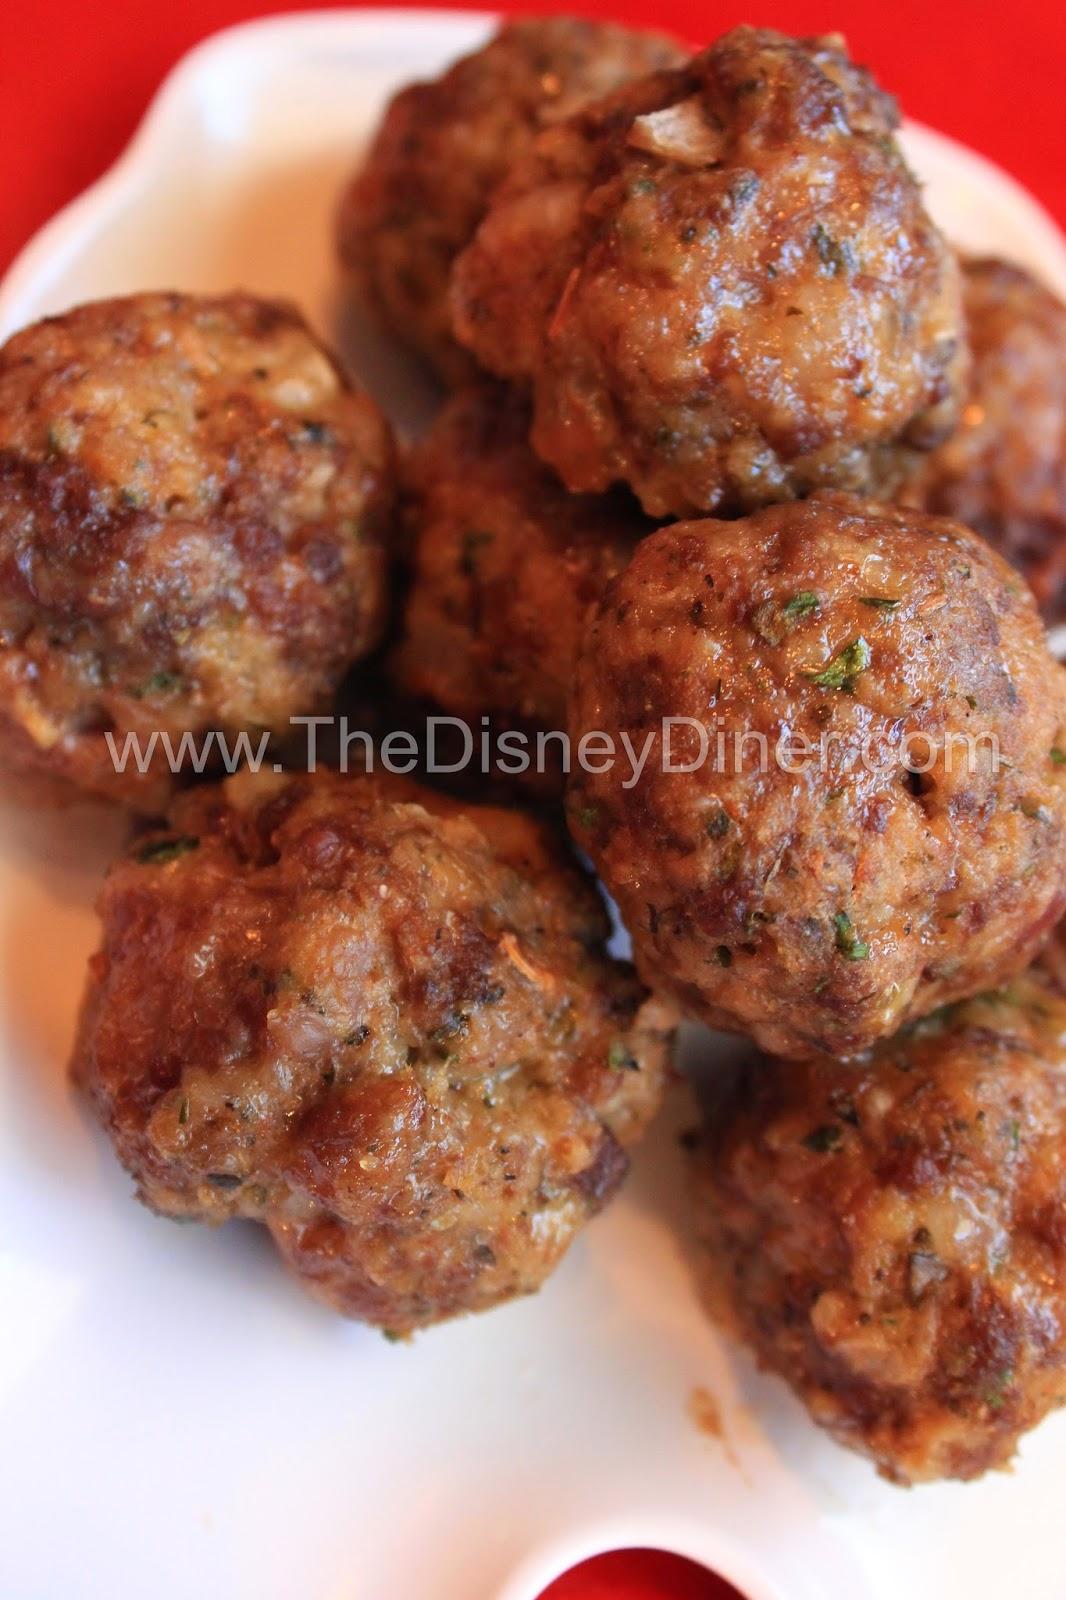 Italian Meatballs Recipe from Tony's Town Square (Magic Kingdom)